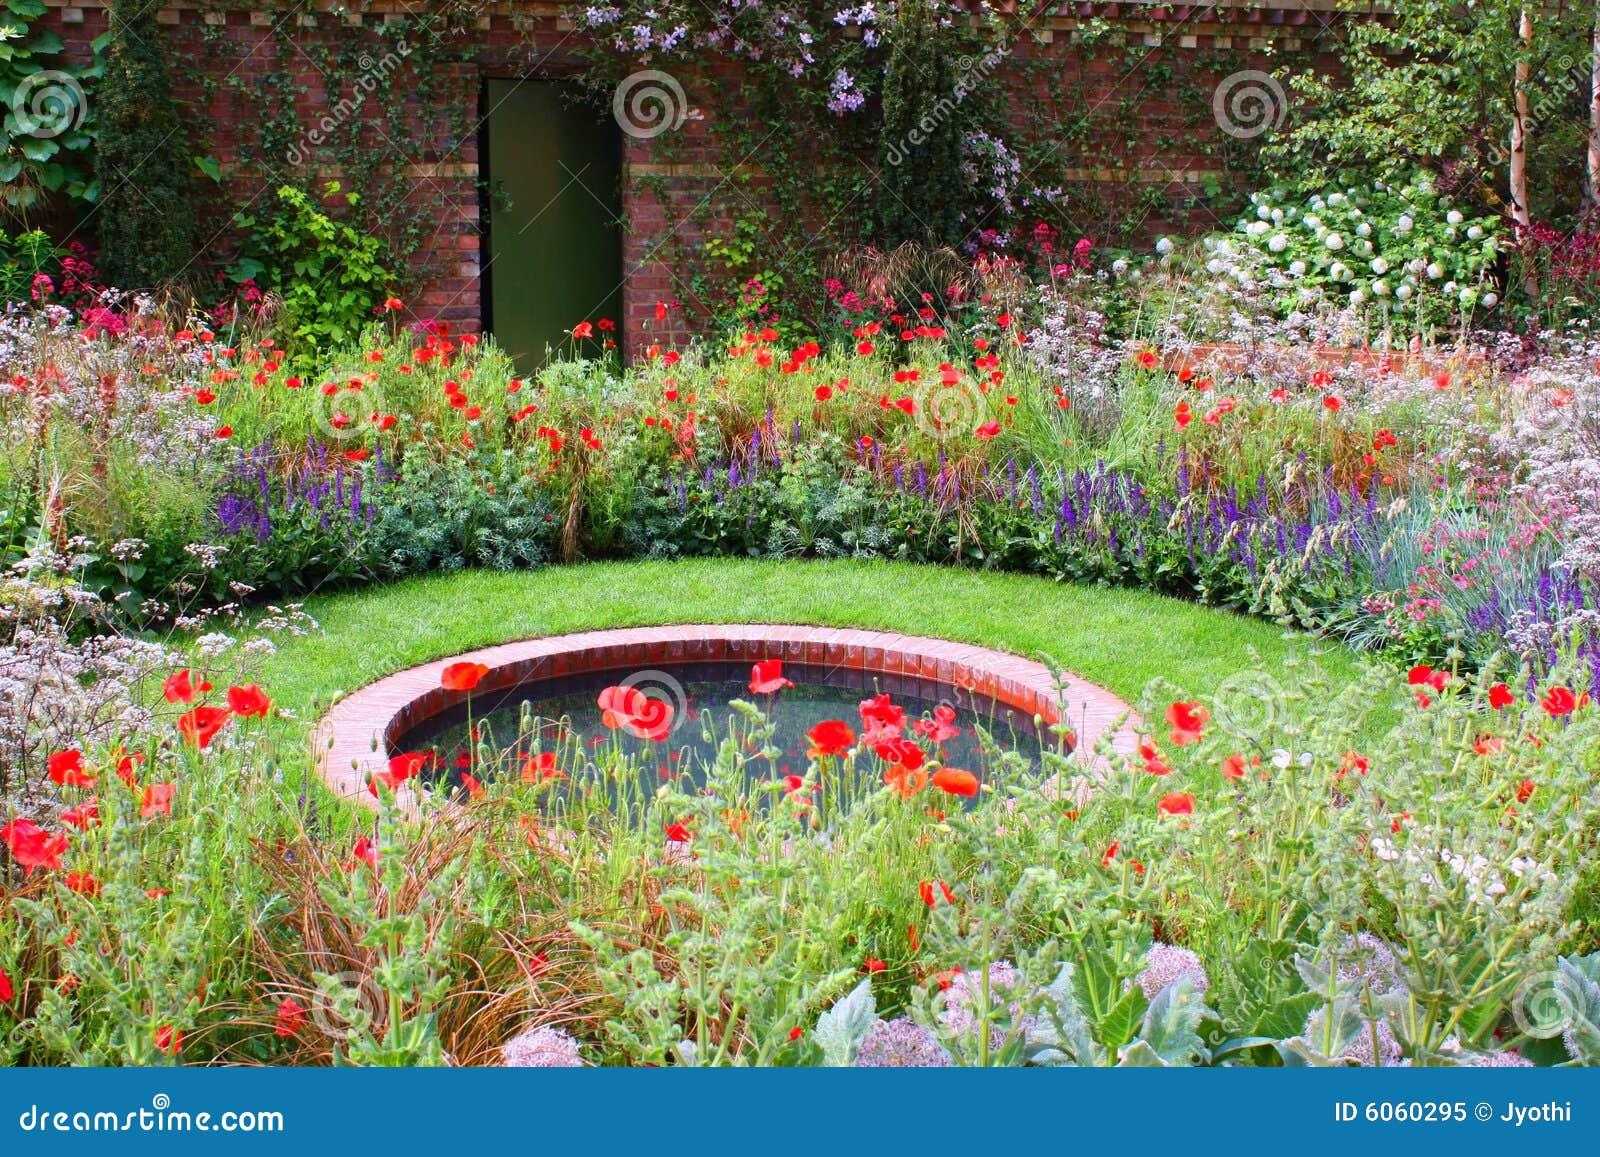 Jardin sauvage photo libre de droits image 6060295 for Jardin sauvage